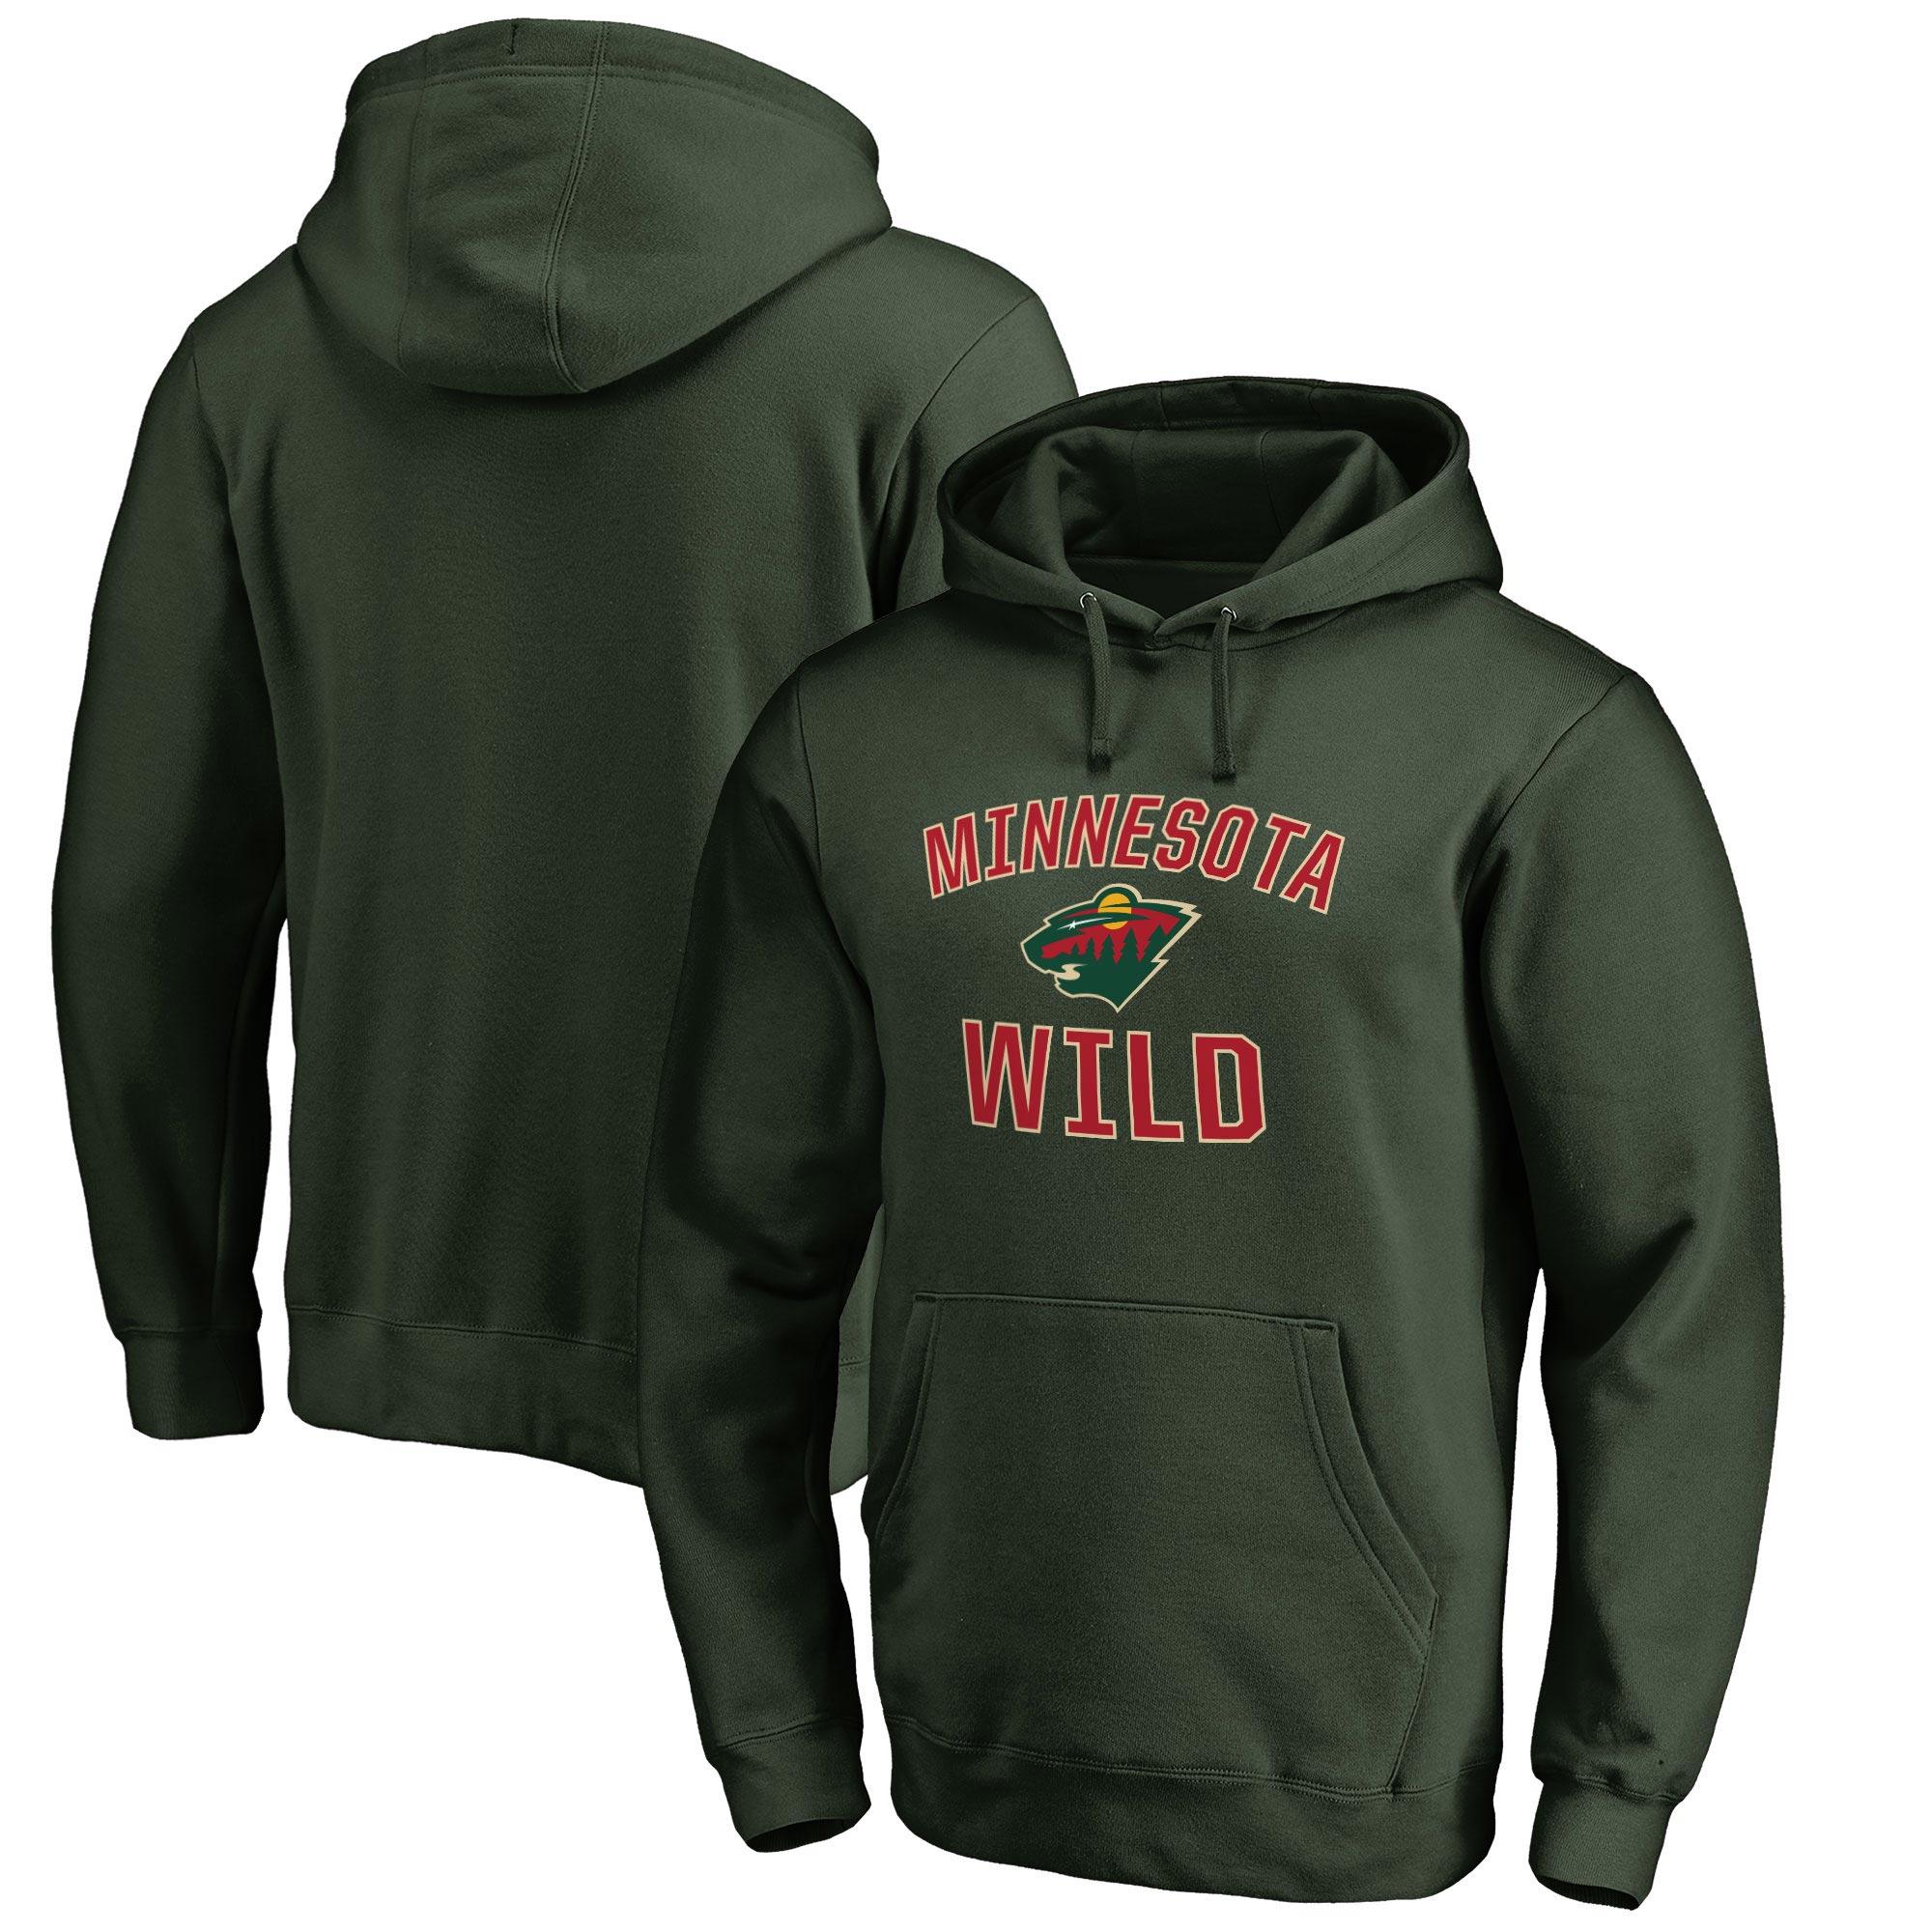 Minnesota Wild Victory Arch Fleece Pullover Hoodie - Green